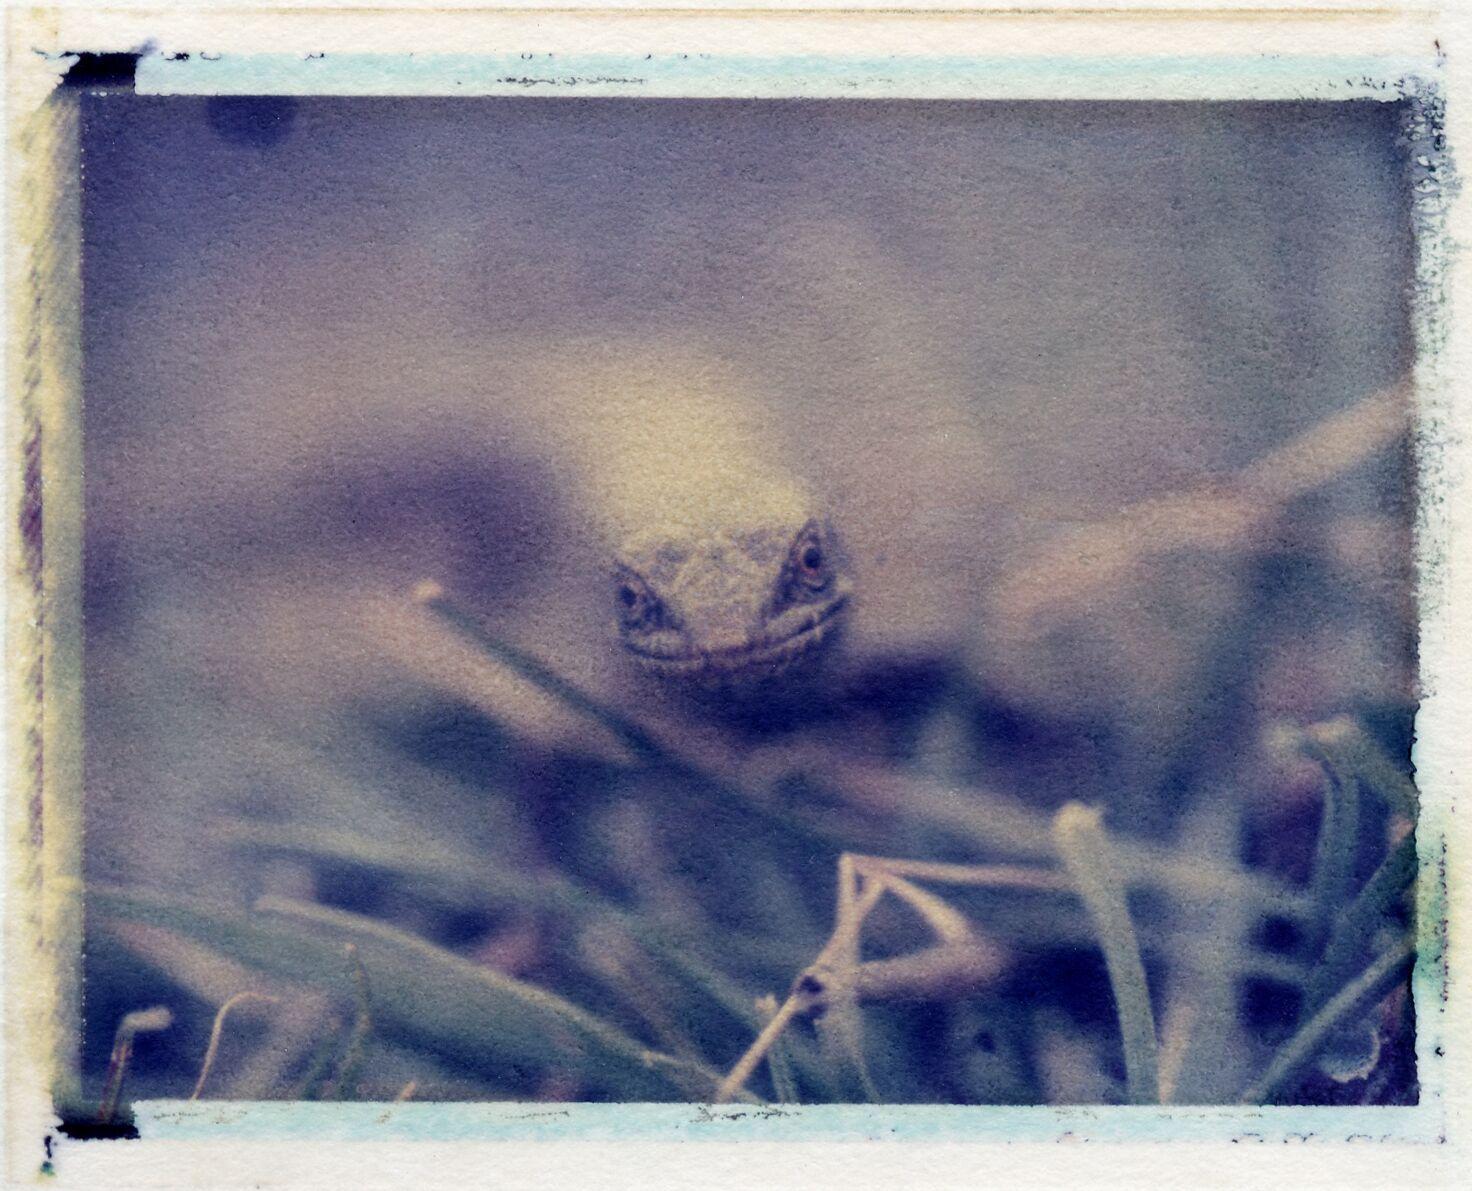 Alligator Lizard | Day Lab | Polaroid 669 film | Matt O'Brien